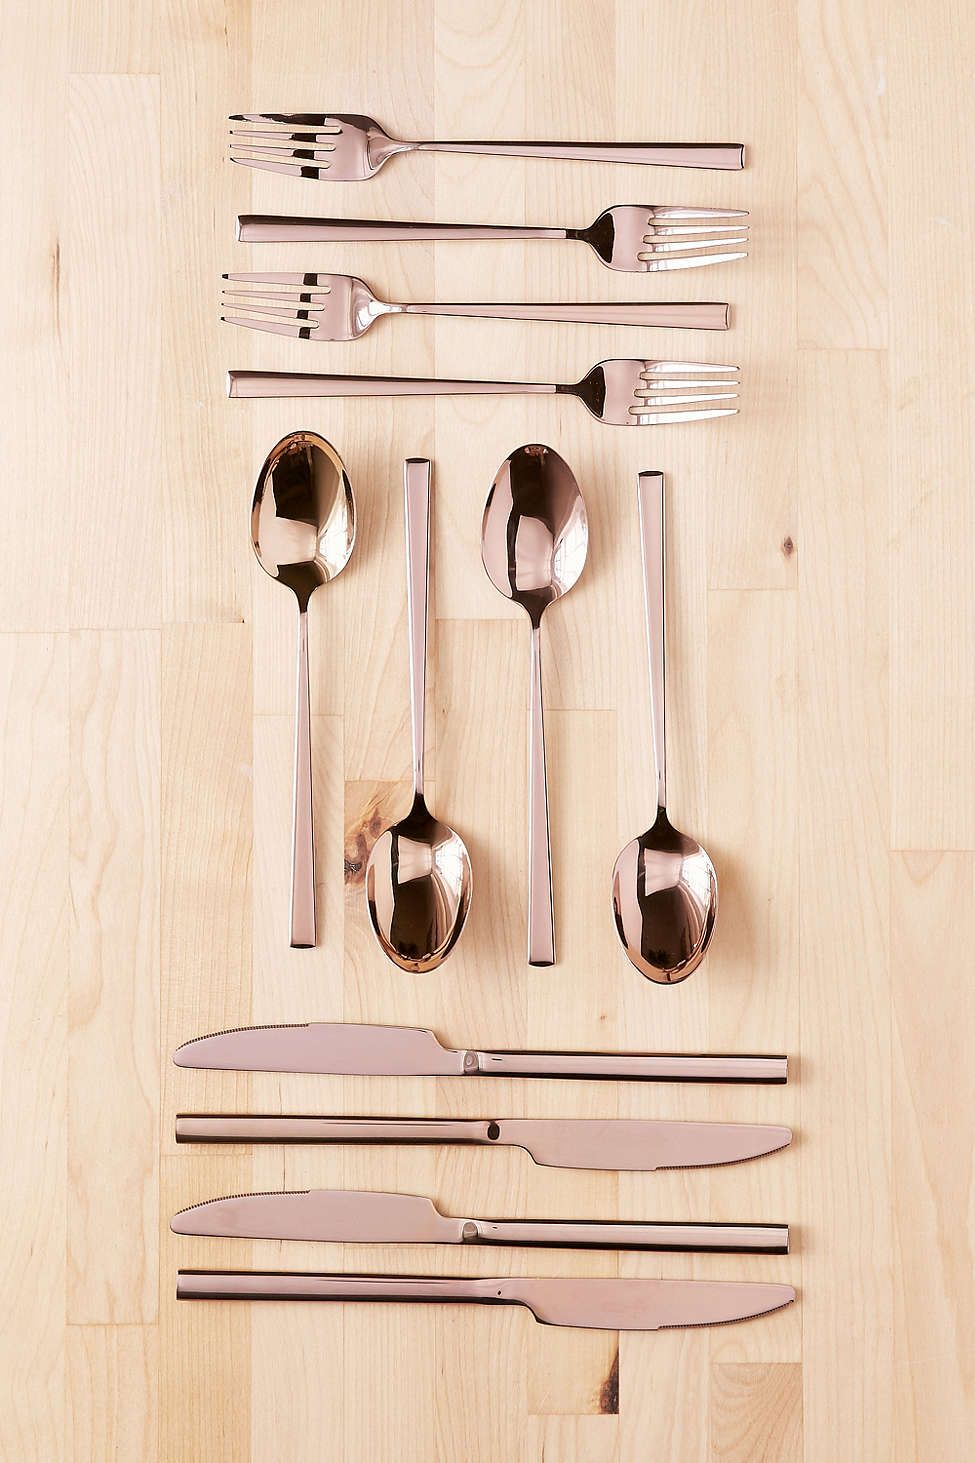 12-piece metallic rose gold flatware set | rose gold | pinterest